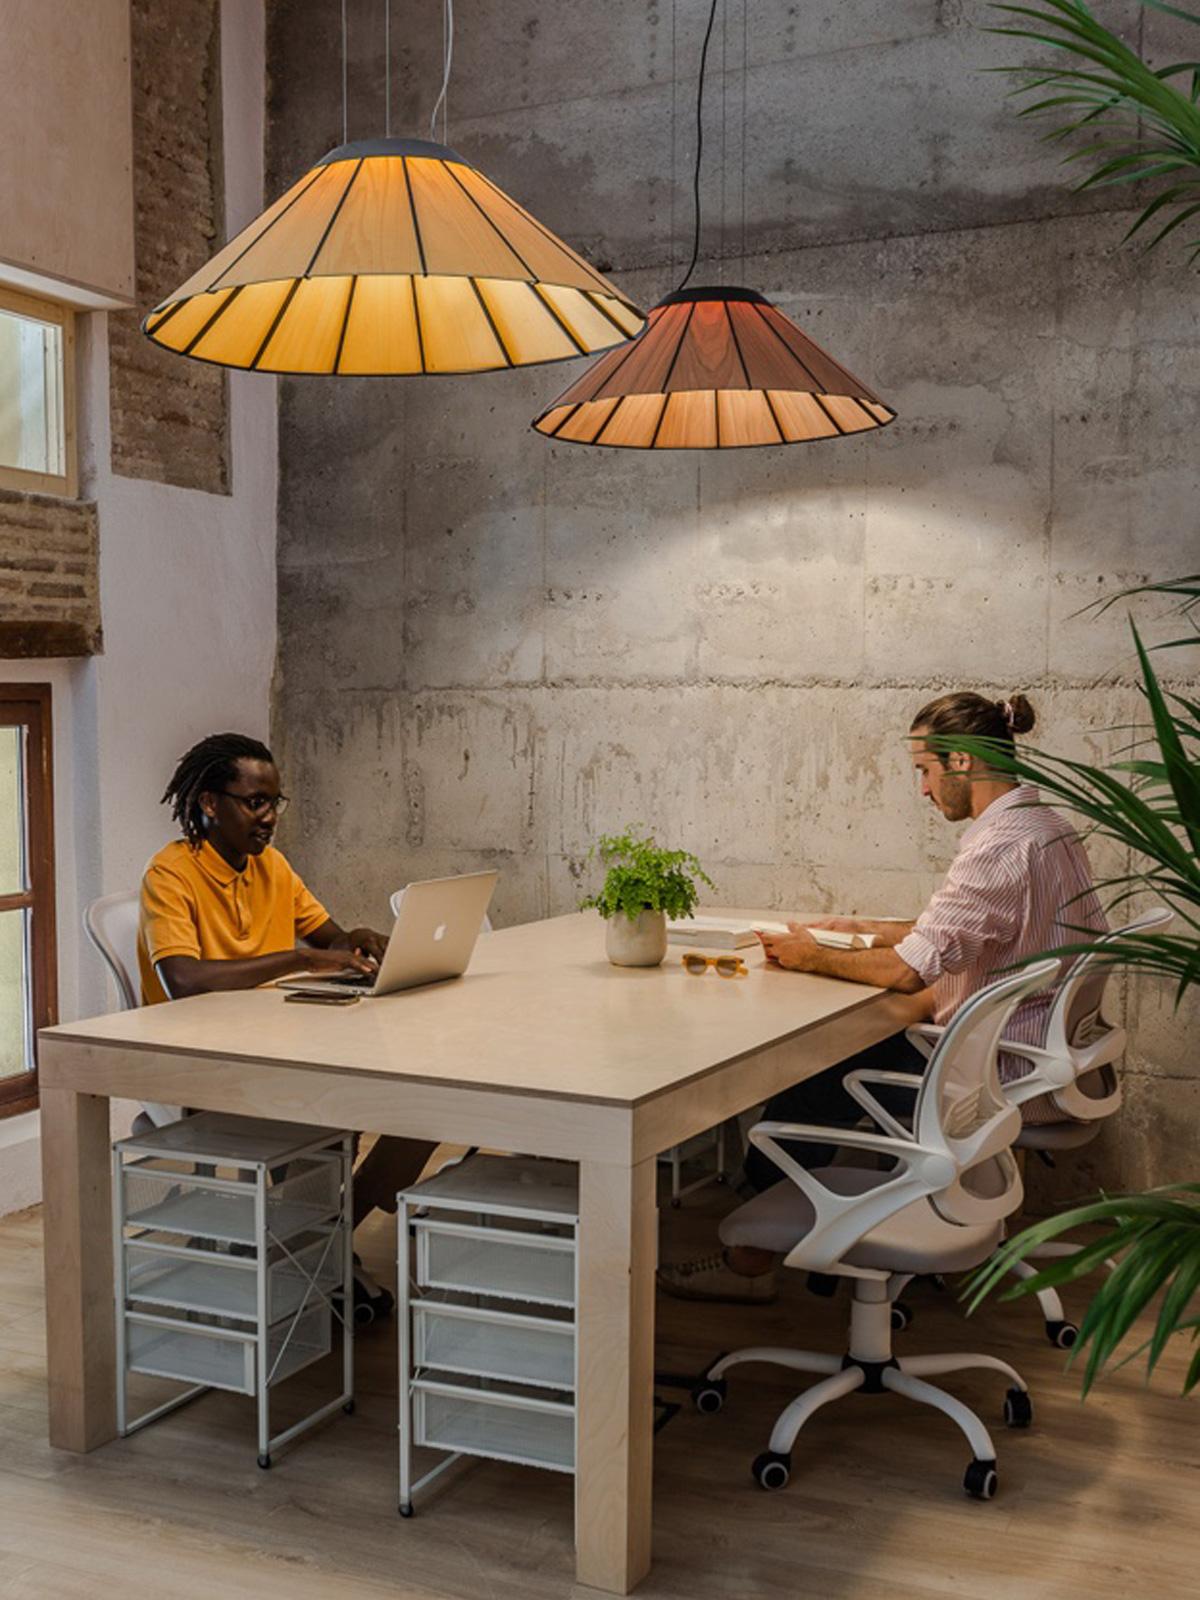 Banga beide Größen LZF Lamps DesignORt Onlineshop